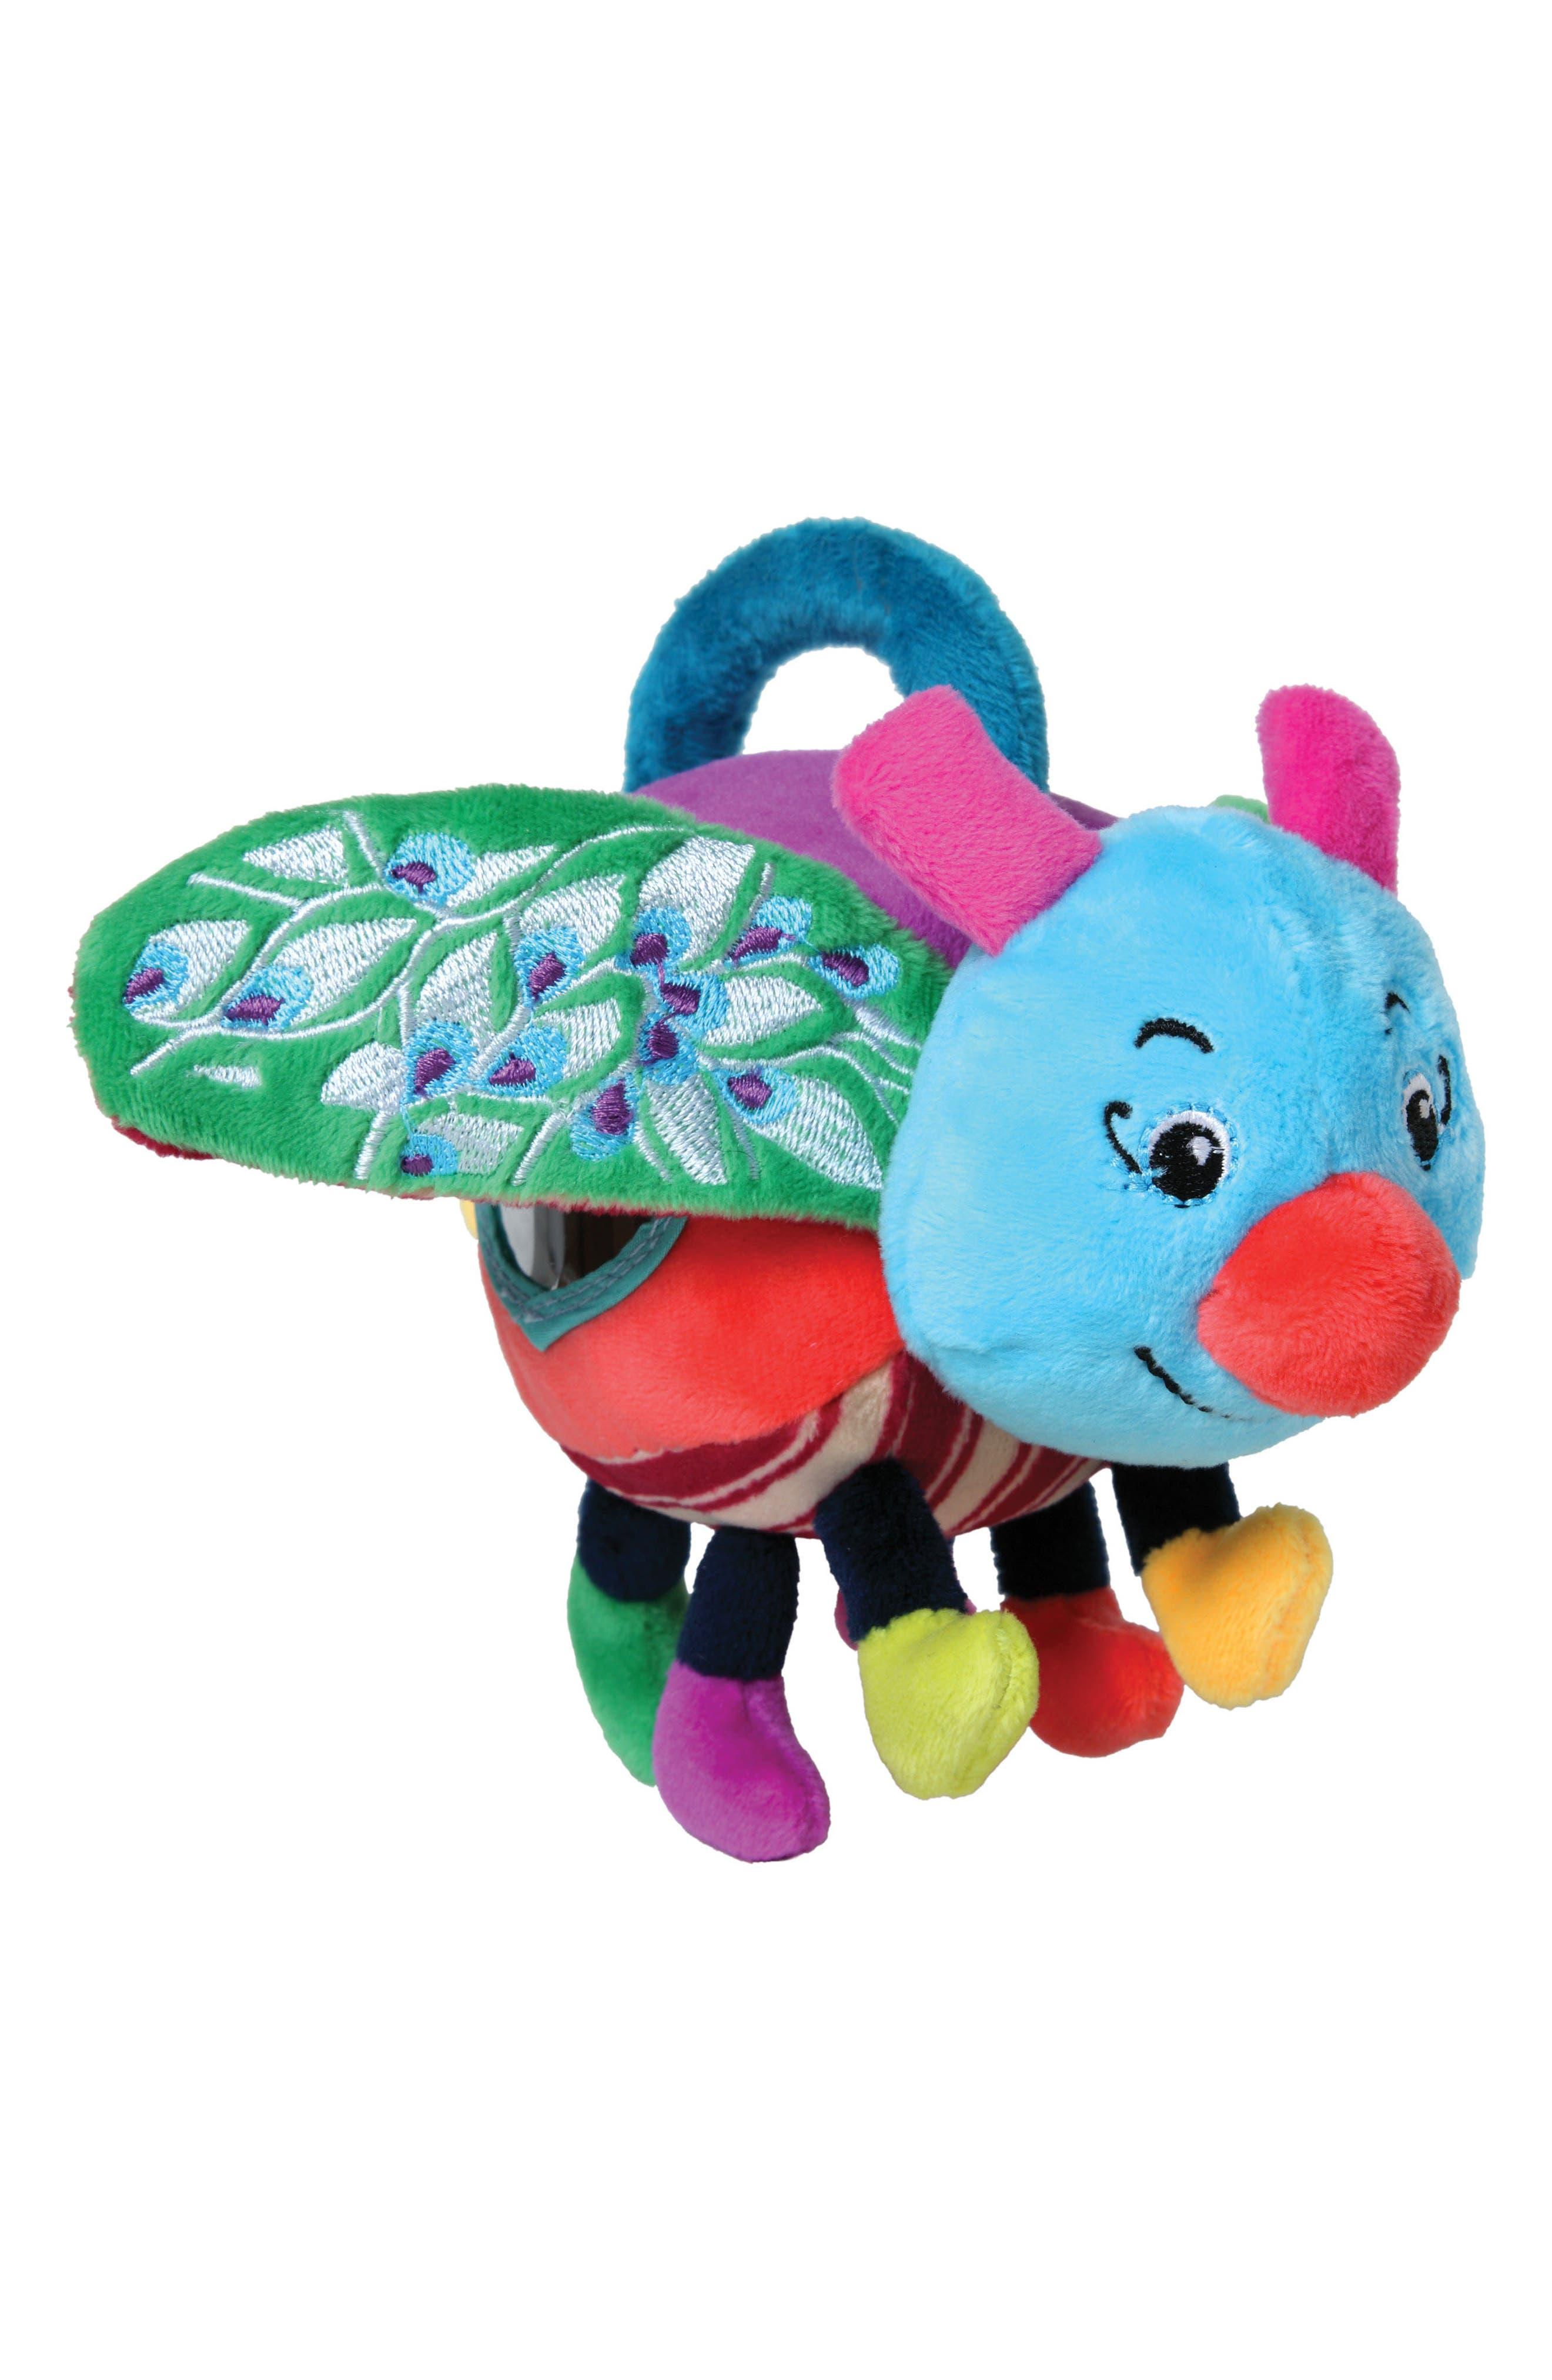 Noisy Bug Stuffed Toy,                             Main thumbnail 1, color,                             Multi